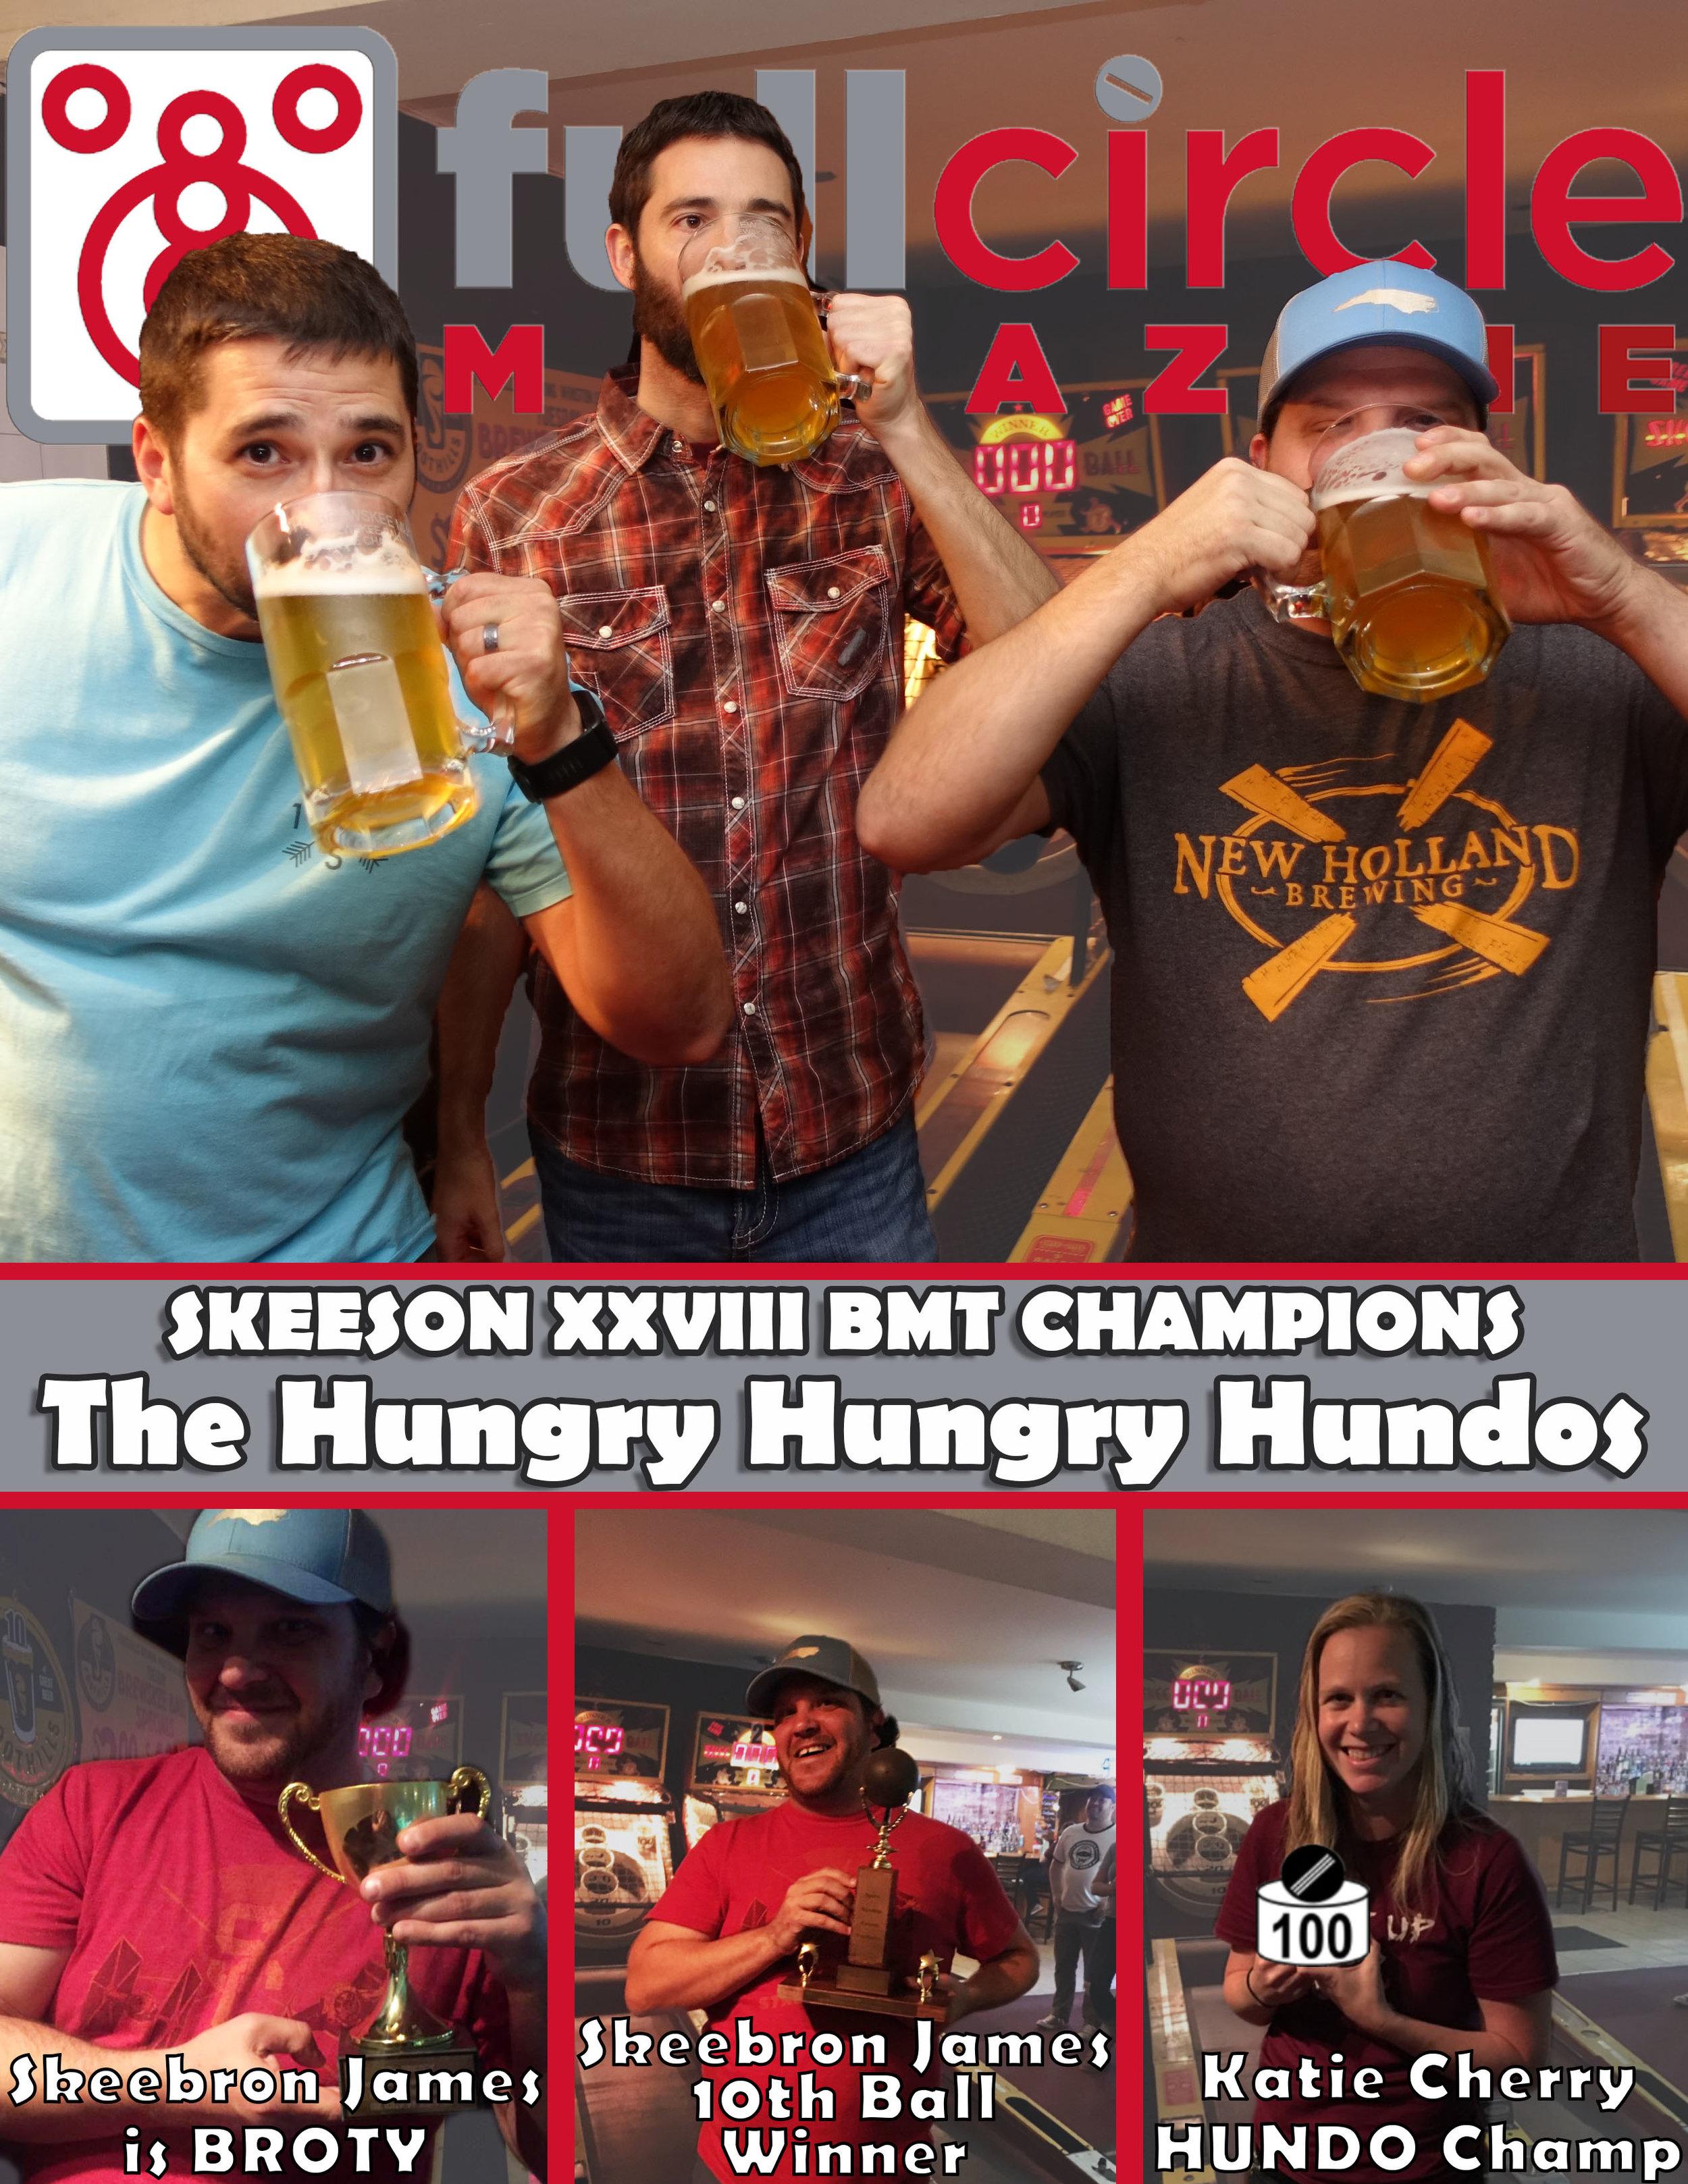 SkeesonXXVIII_Champions.jpg